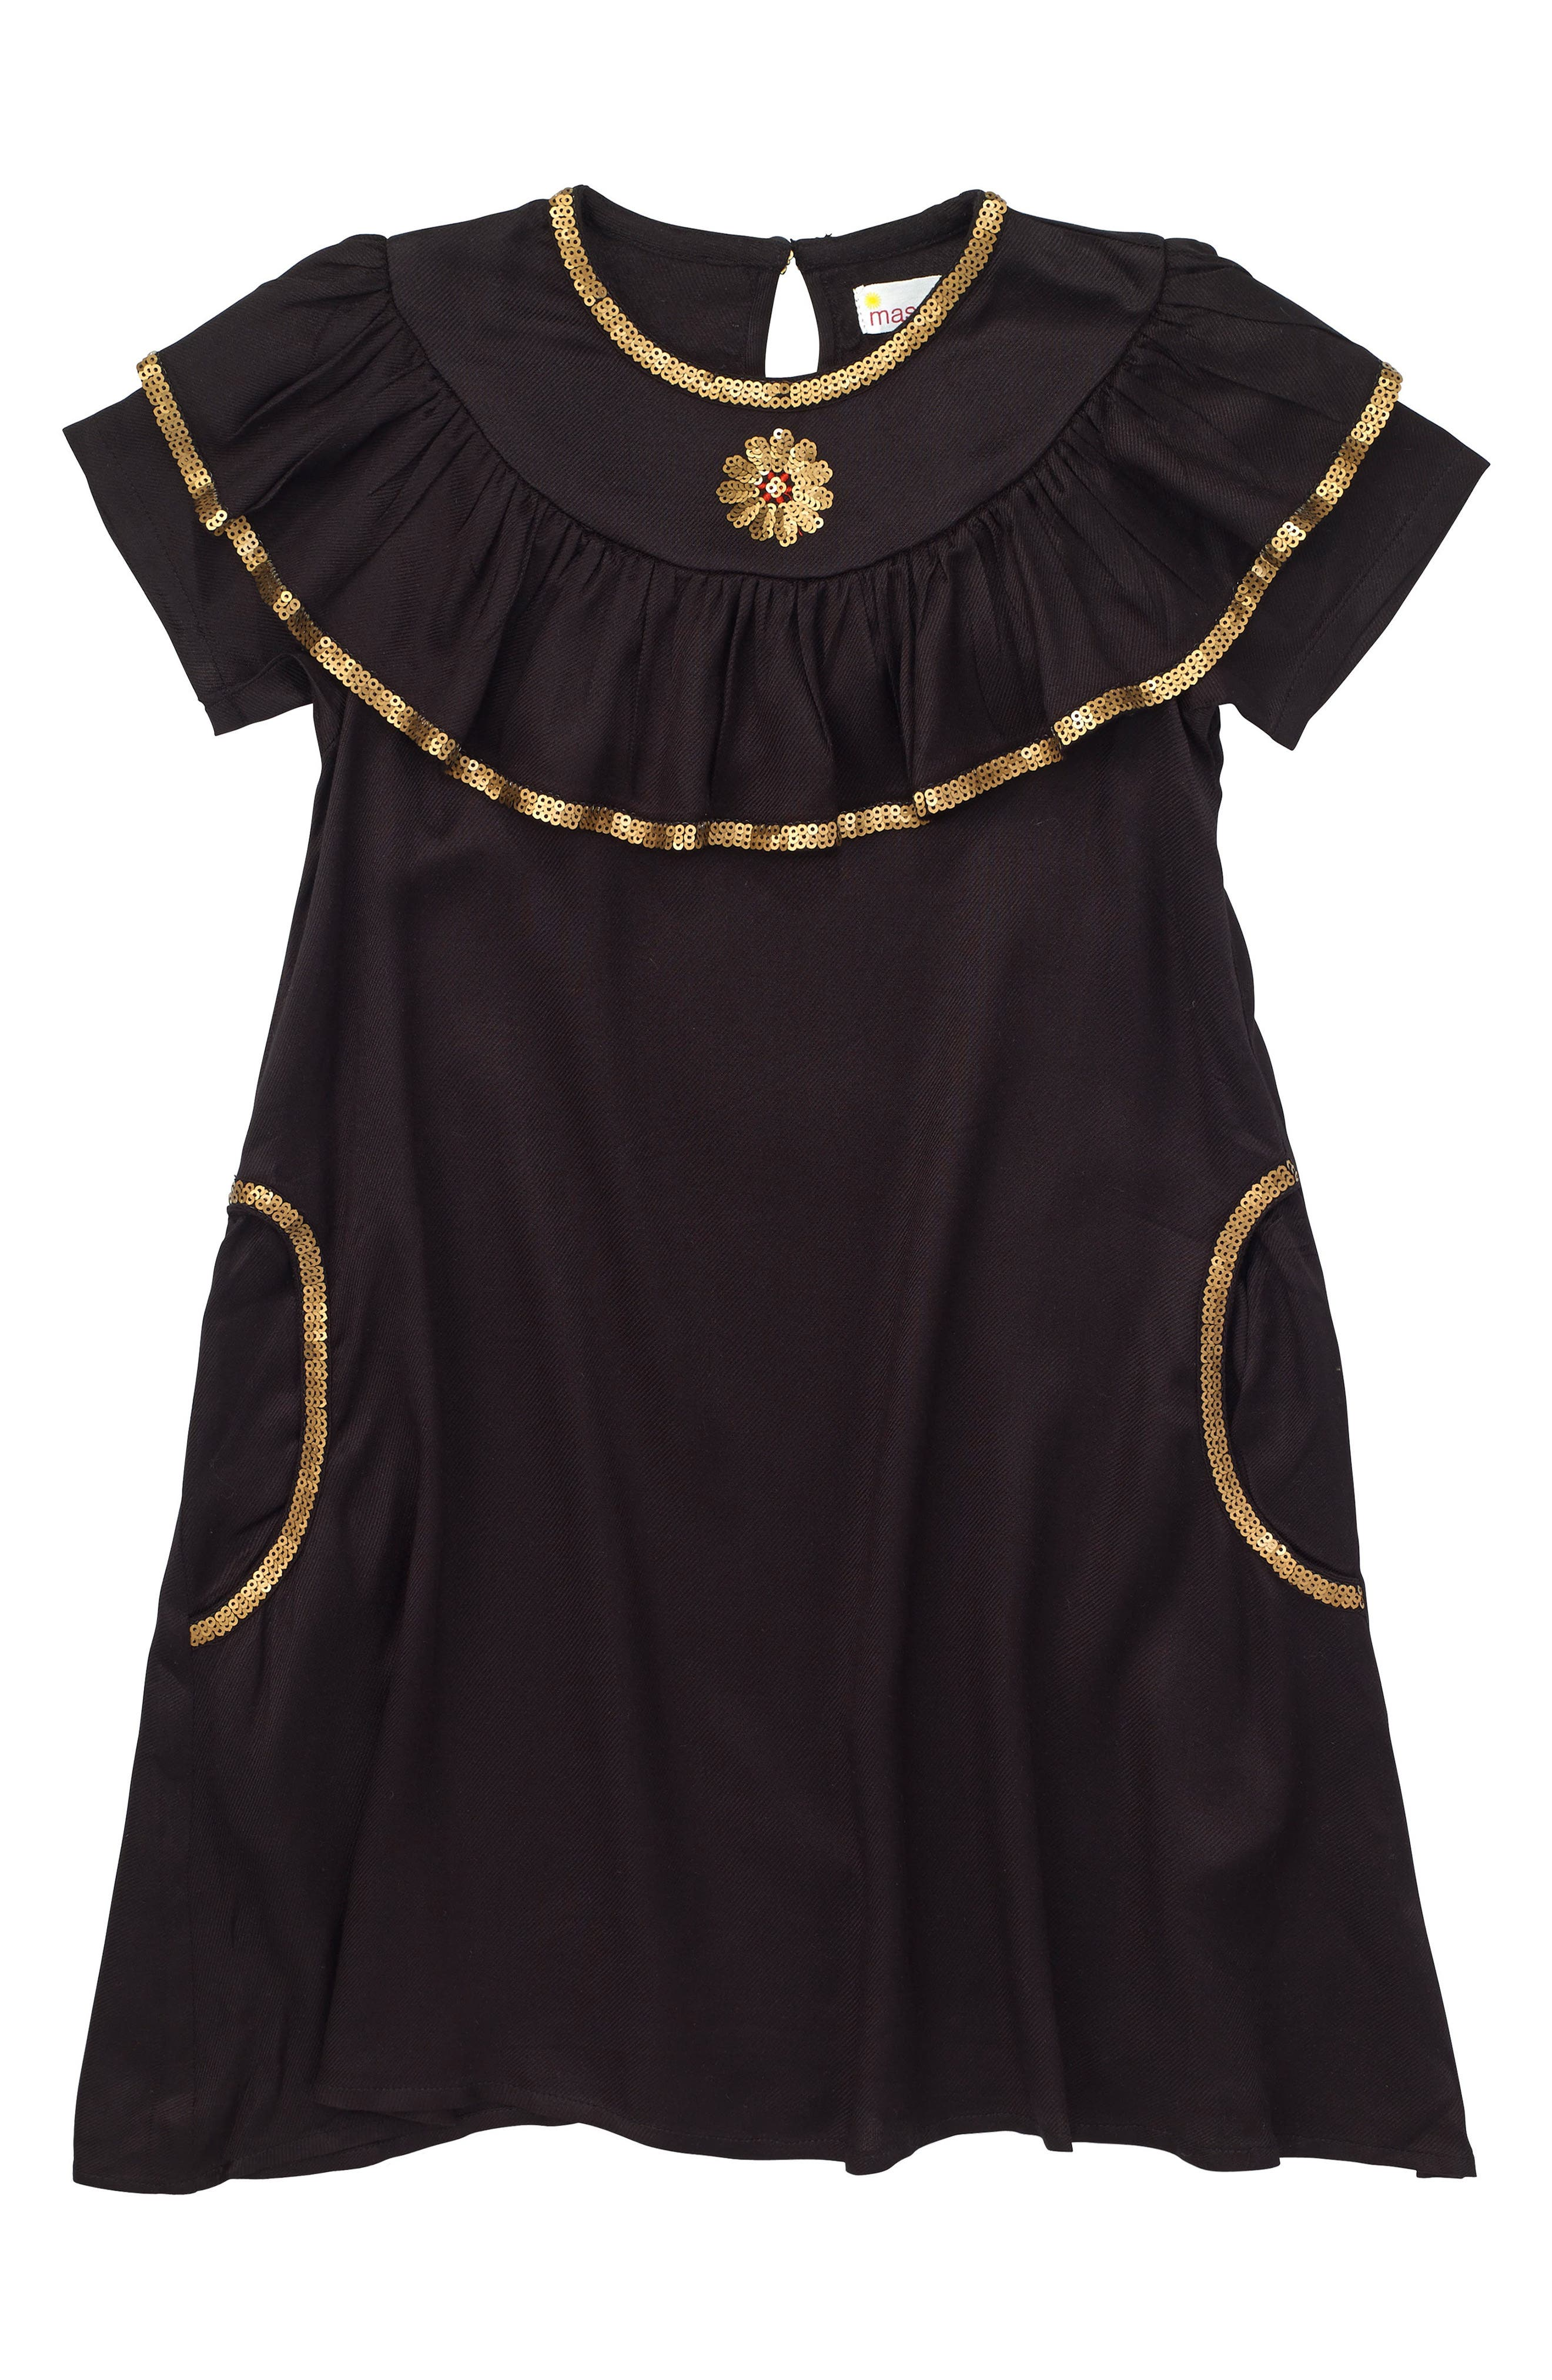 Enchanted Dress,                         Main,                         color, Black